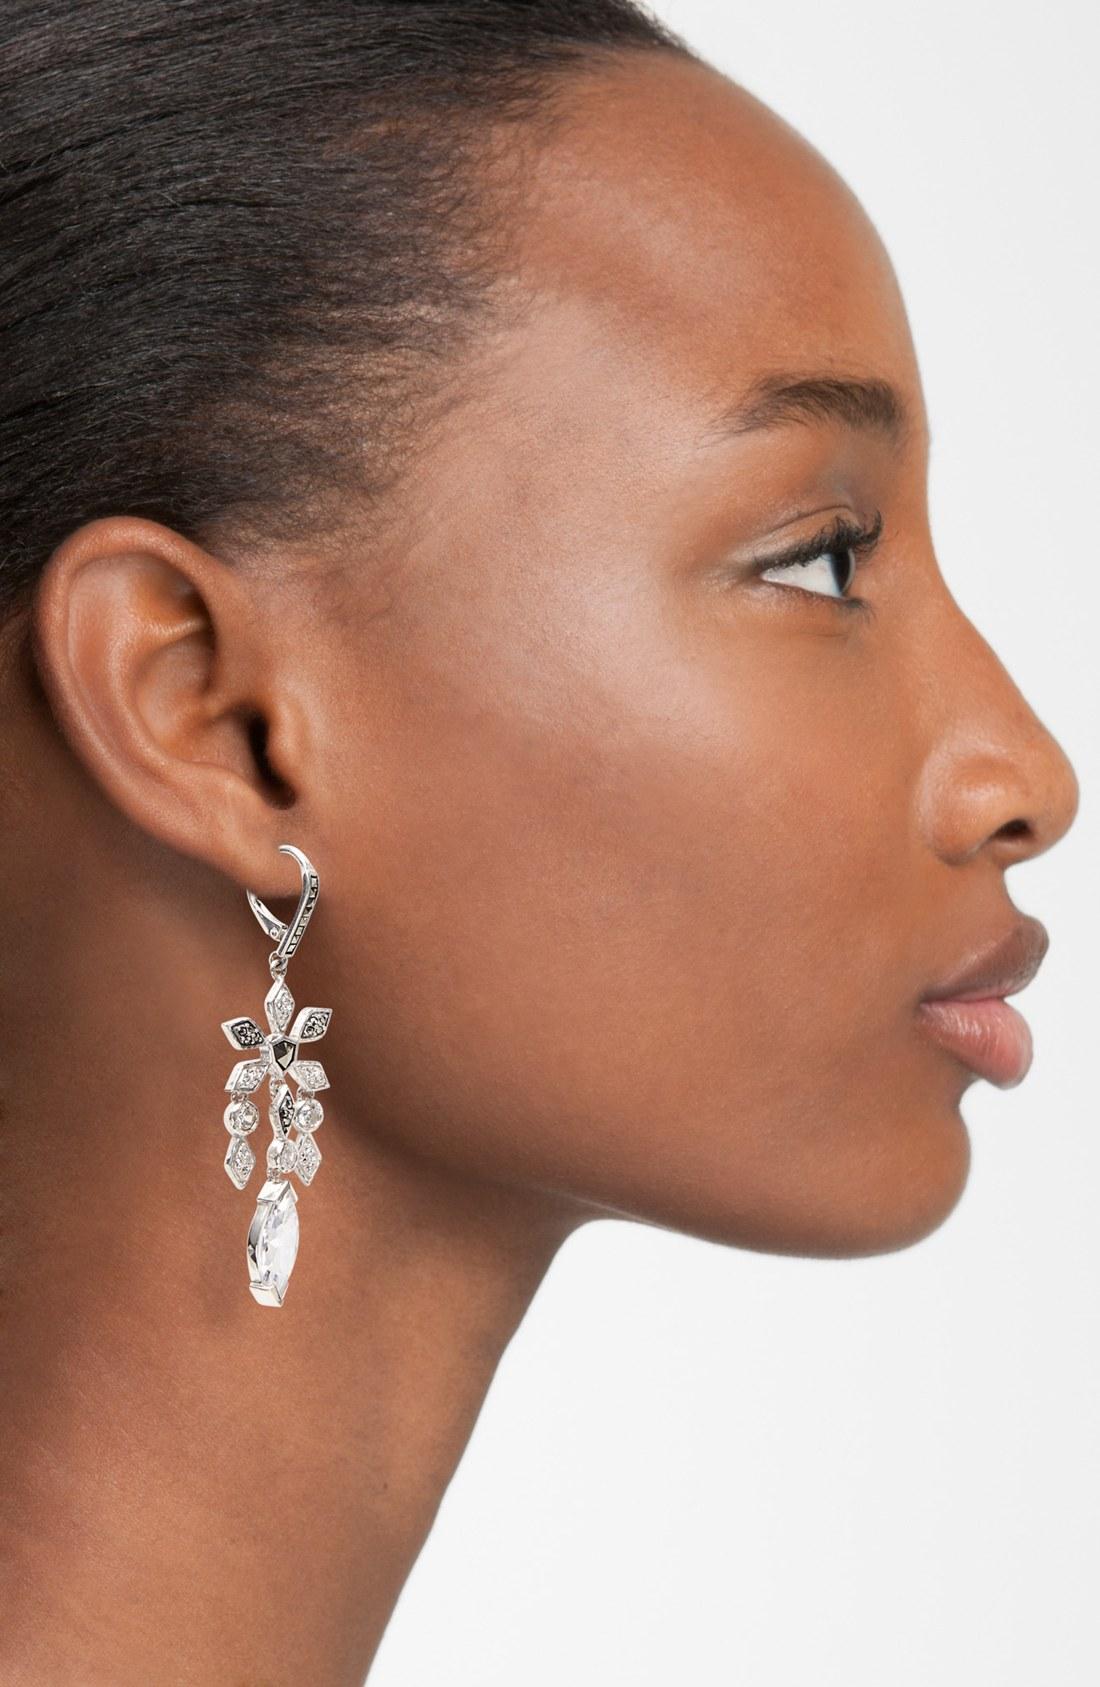 Judith Jack - judith-jack-silver-crystal-frosted-glaze-chandelier-earrings-product-2-15176100-671469329